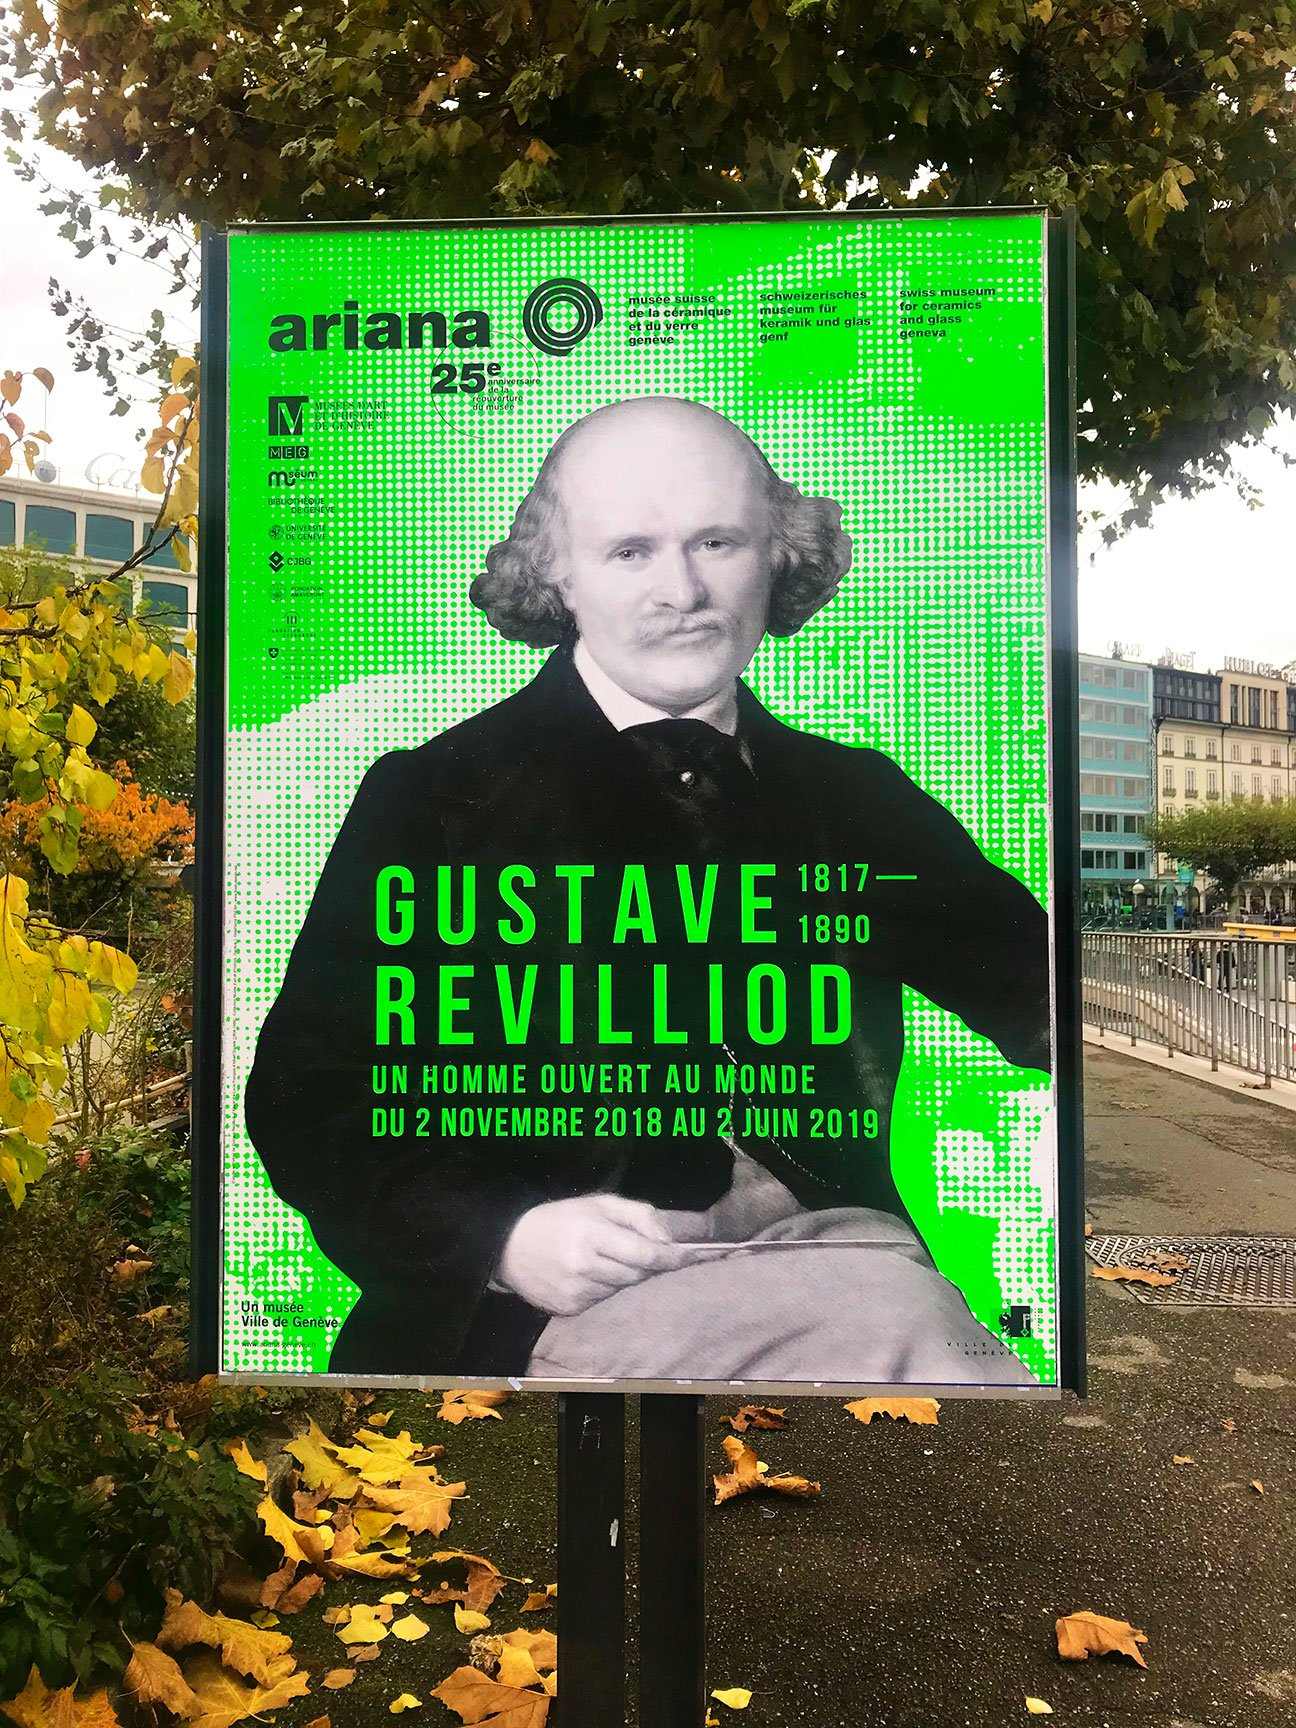 fabien-cuffel-exposition-revilliod-musee-ariana-geneve-affiche